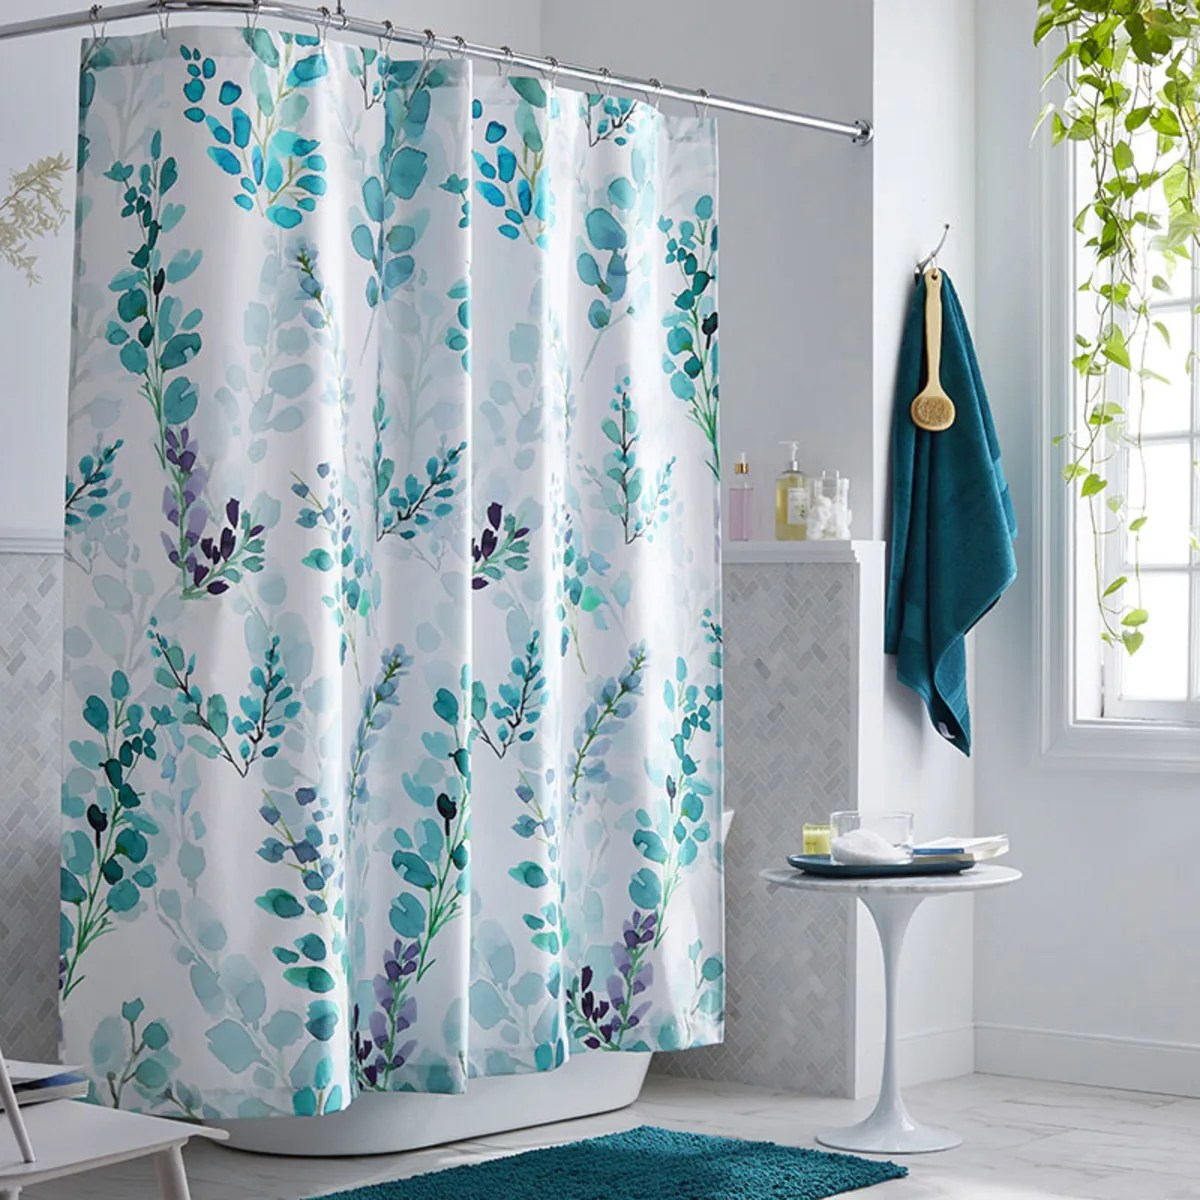 legends hotel reece floral wrinkle free sateen shower curtain